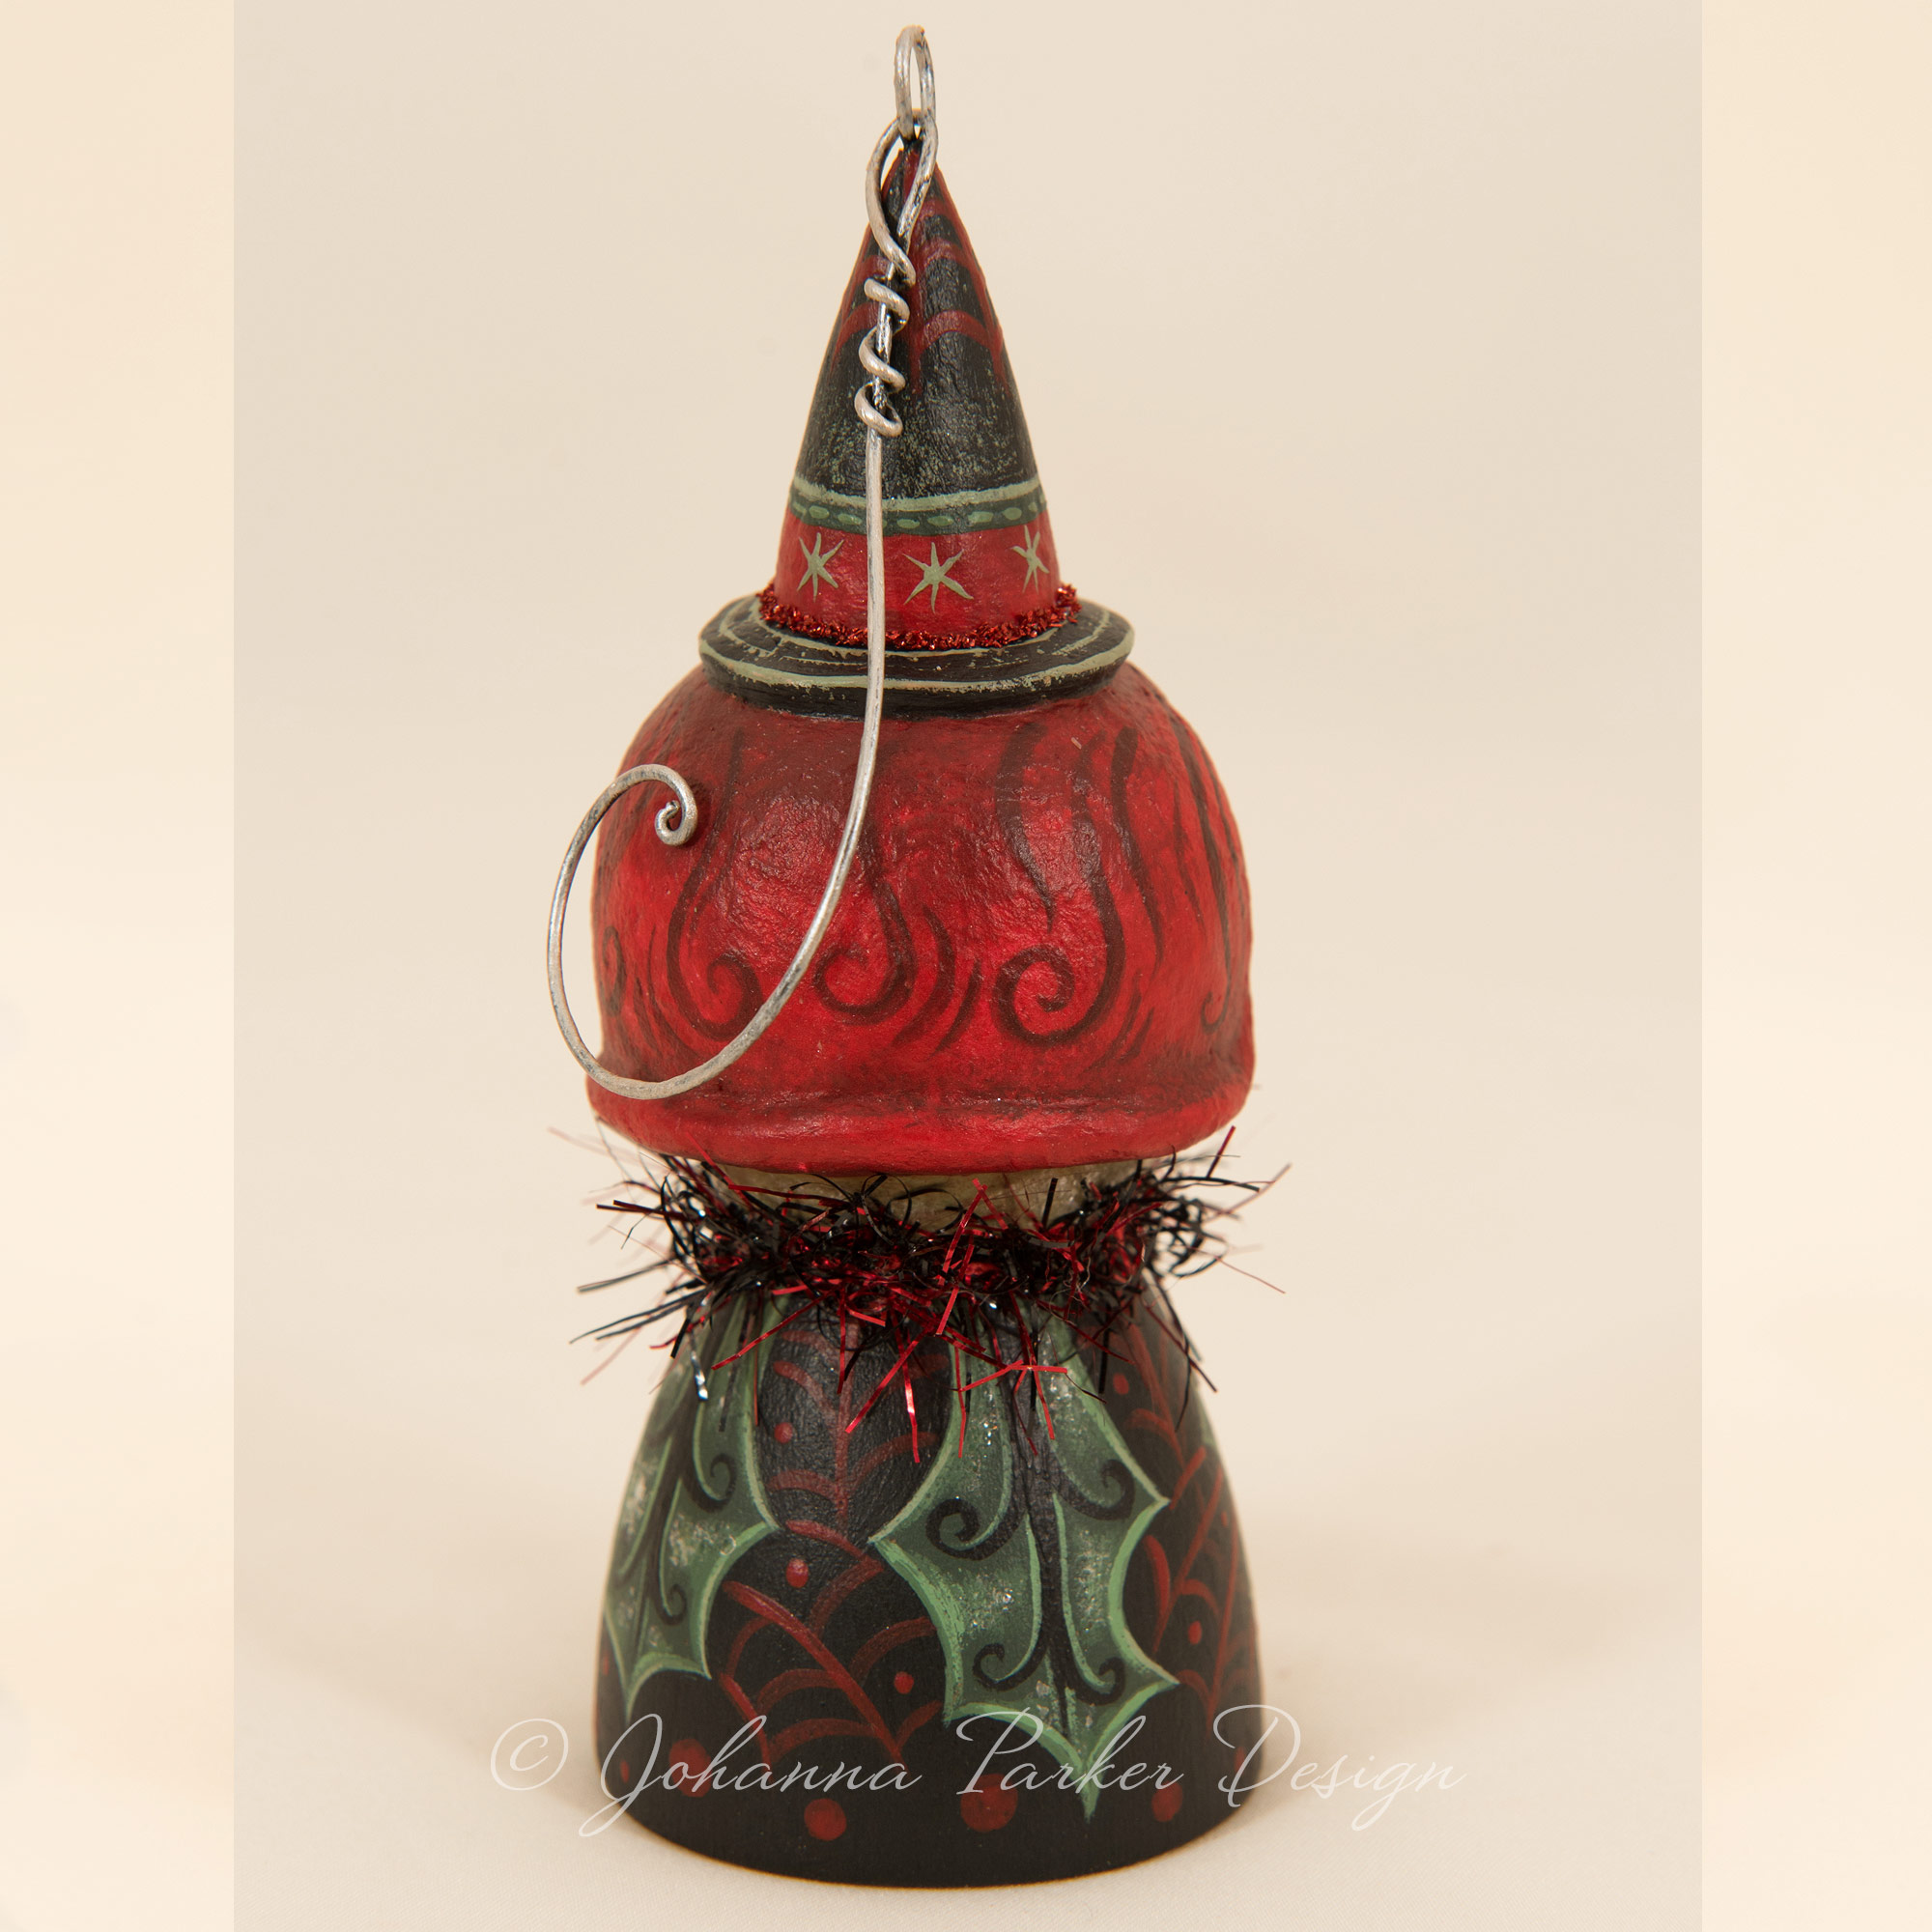 Johanna-Parker-Holly-Witch-Bell-Ornament-4.jpg